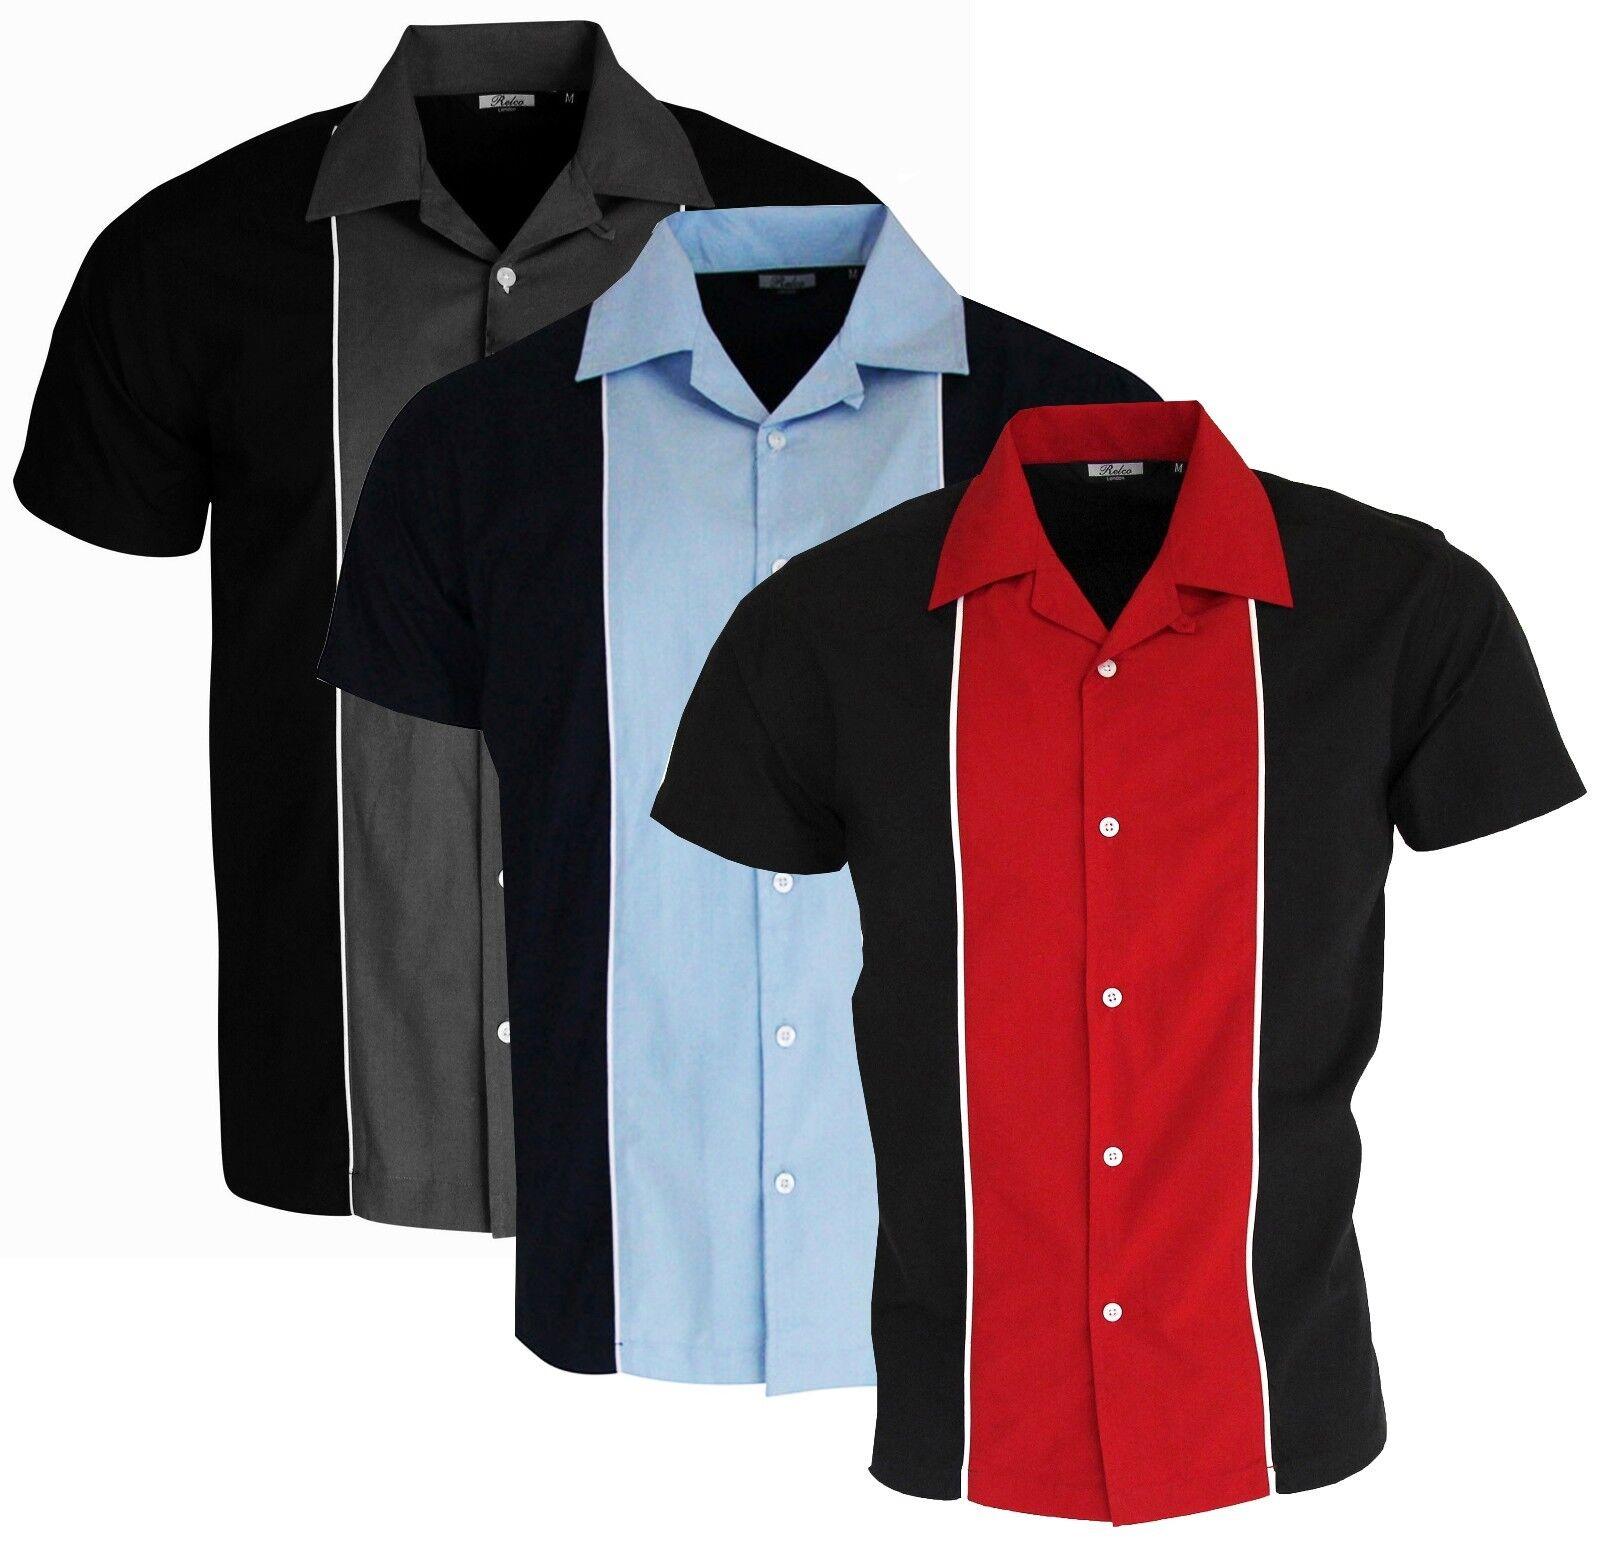 Mens Bowling Shirt Grey Red Blue Options Open Neck Ten Pin 50's Rockabilly Relco